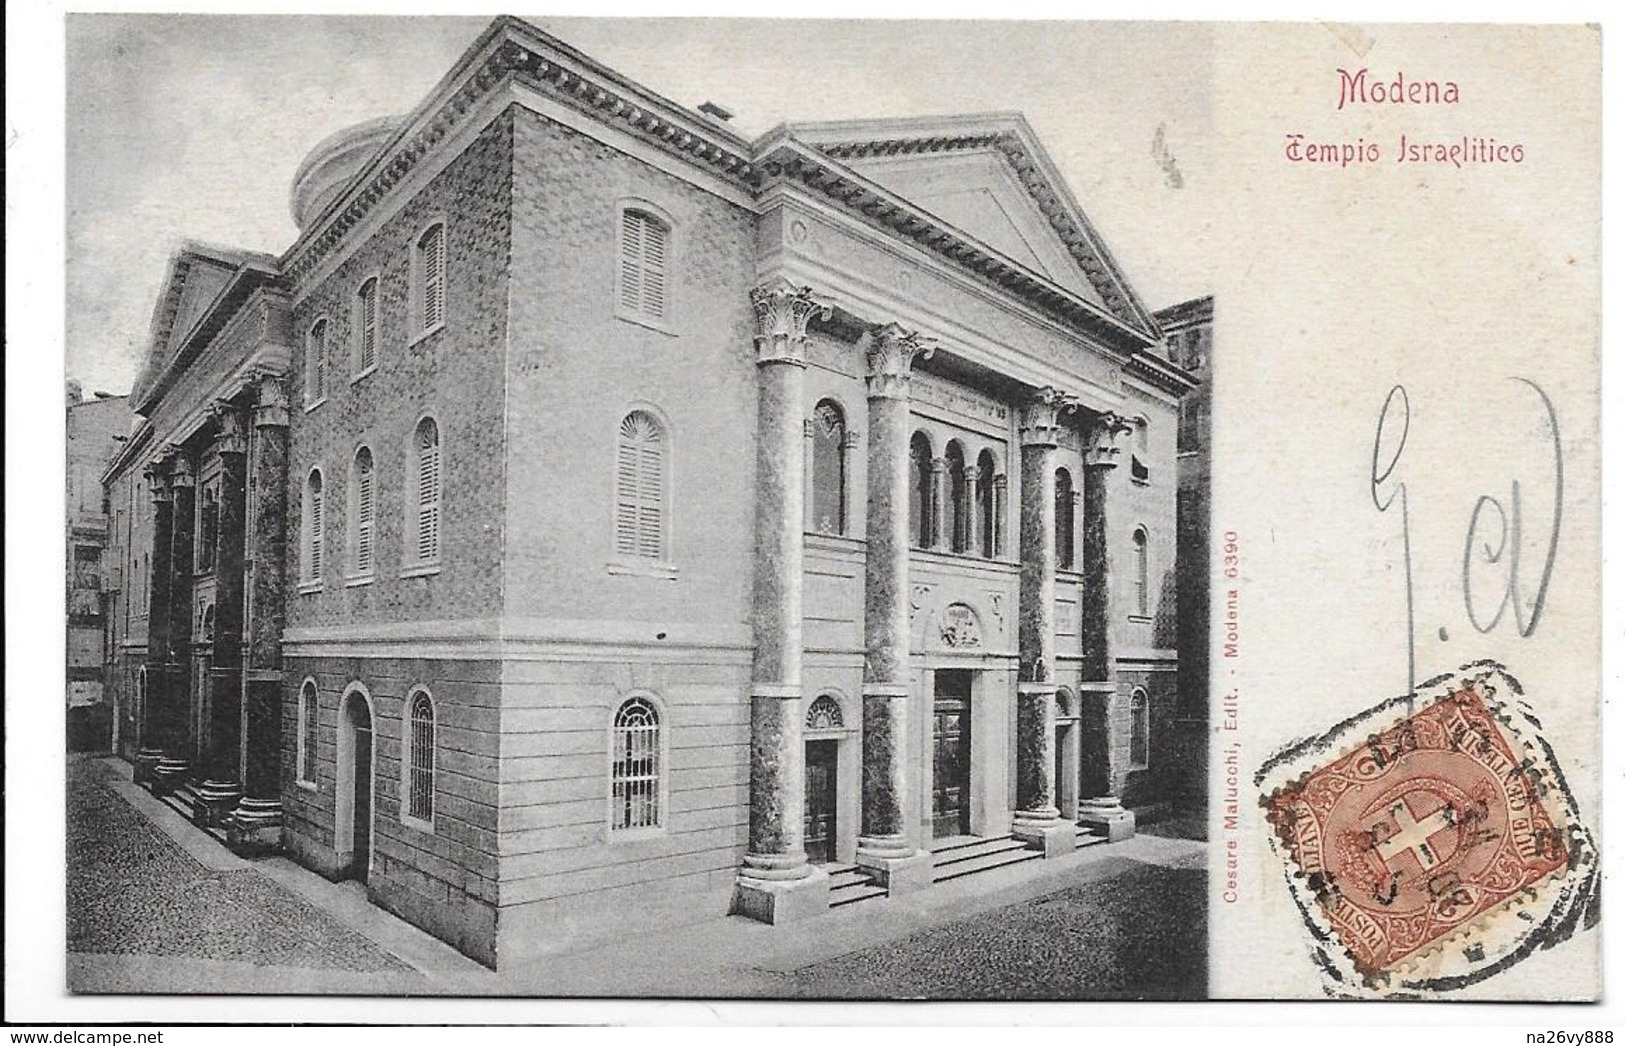 Modena Tempio Israelitico - Sinagoga Judaica - Synagogue. - Modena